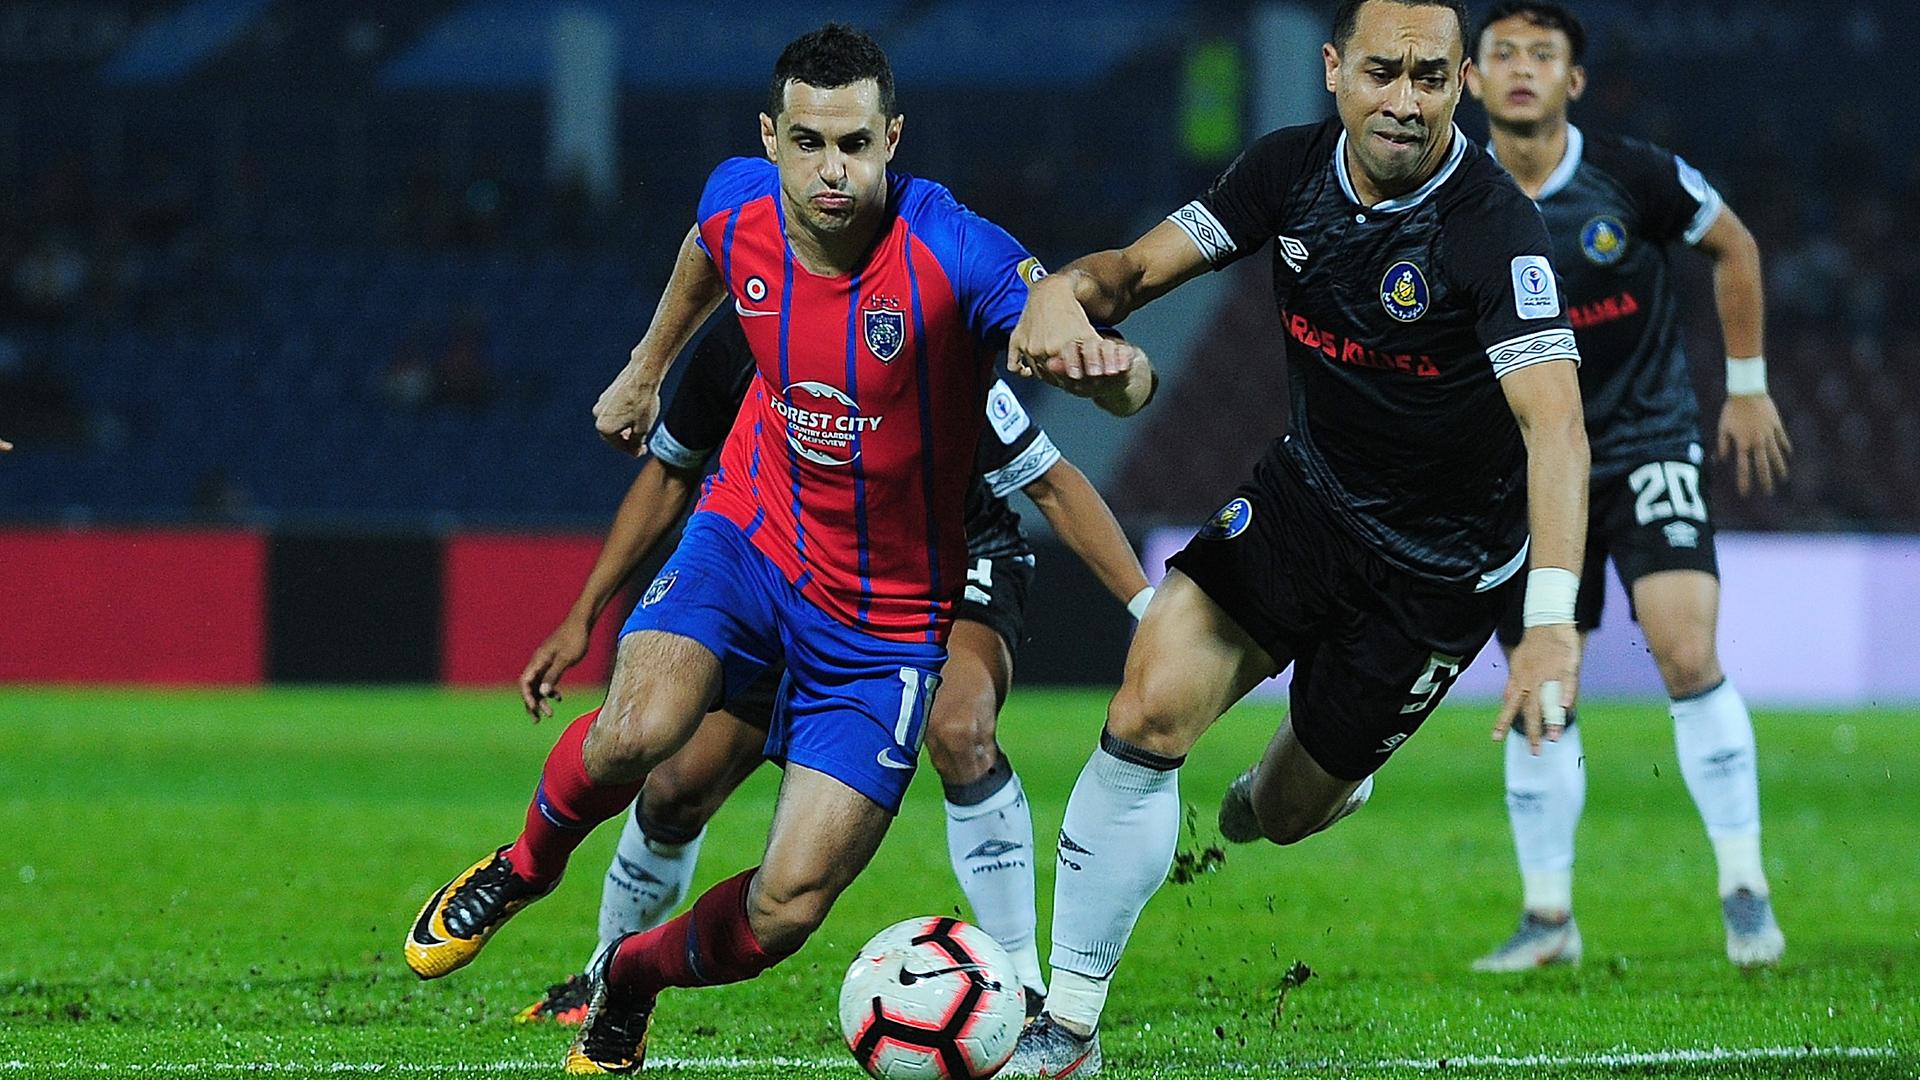 Norshahrul Idlan Talaha, Johor Darul Ta'zim v Pahang, Malaysia Super League, 14 May 2019